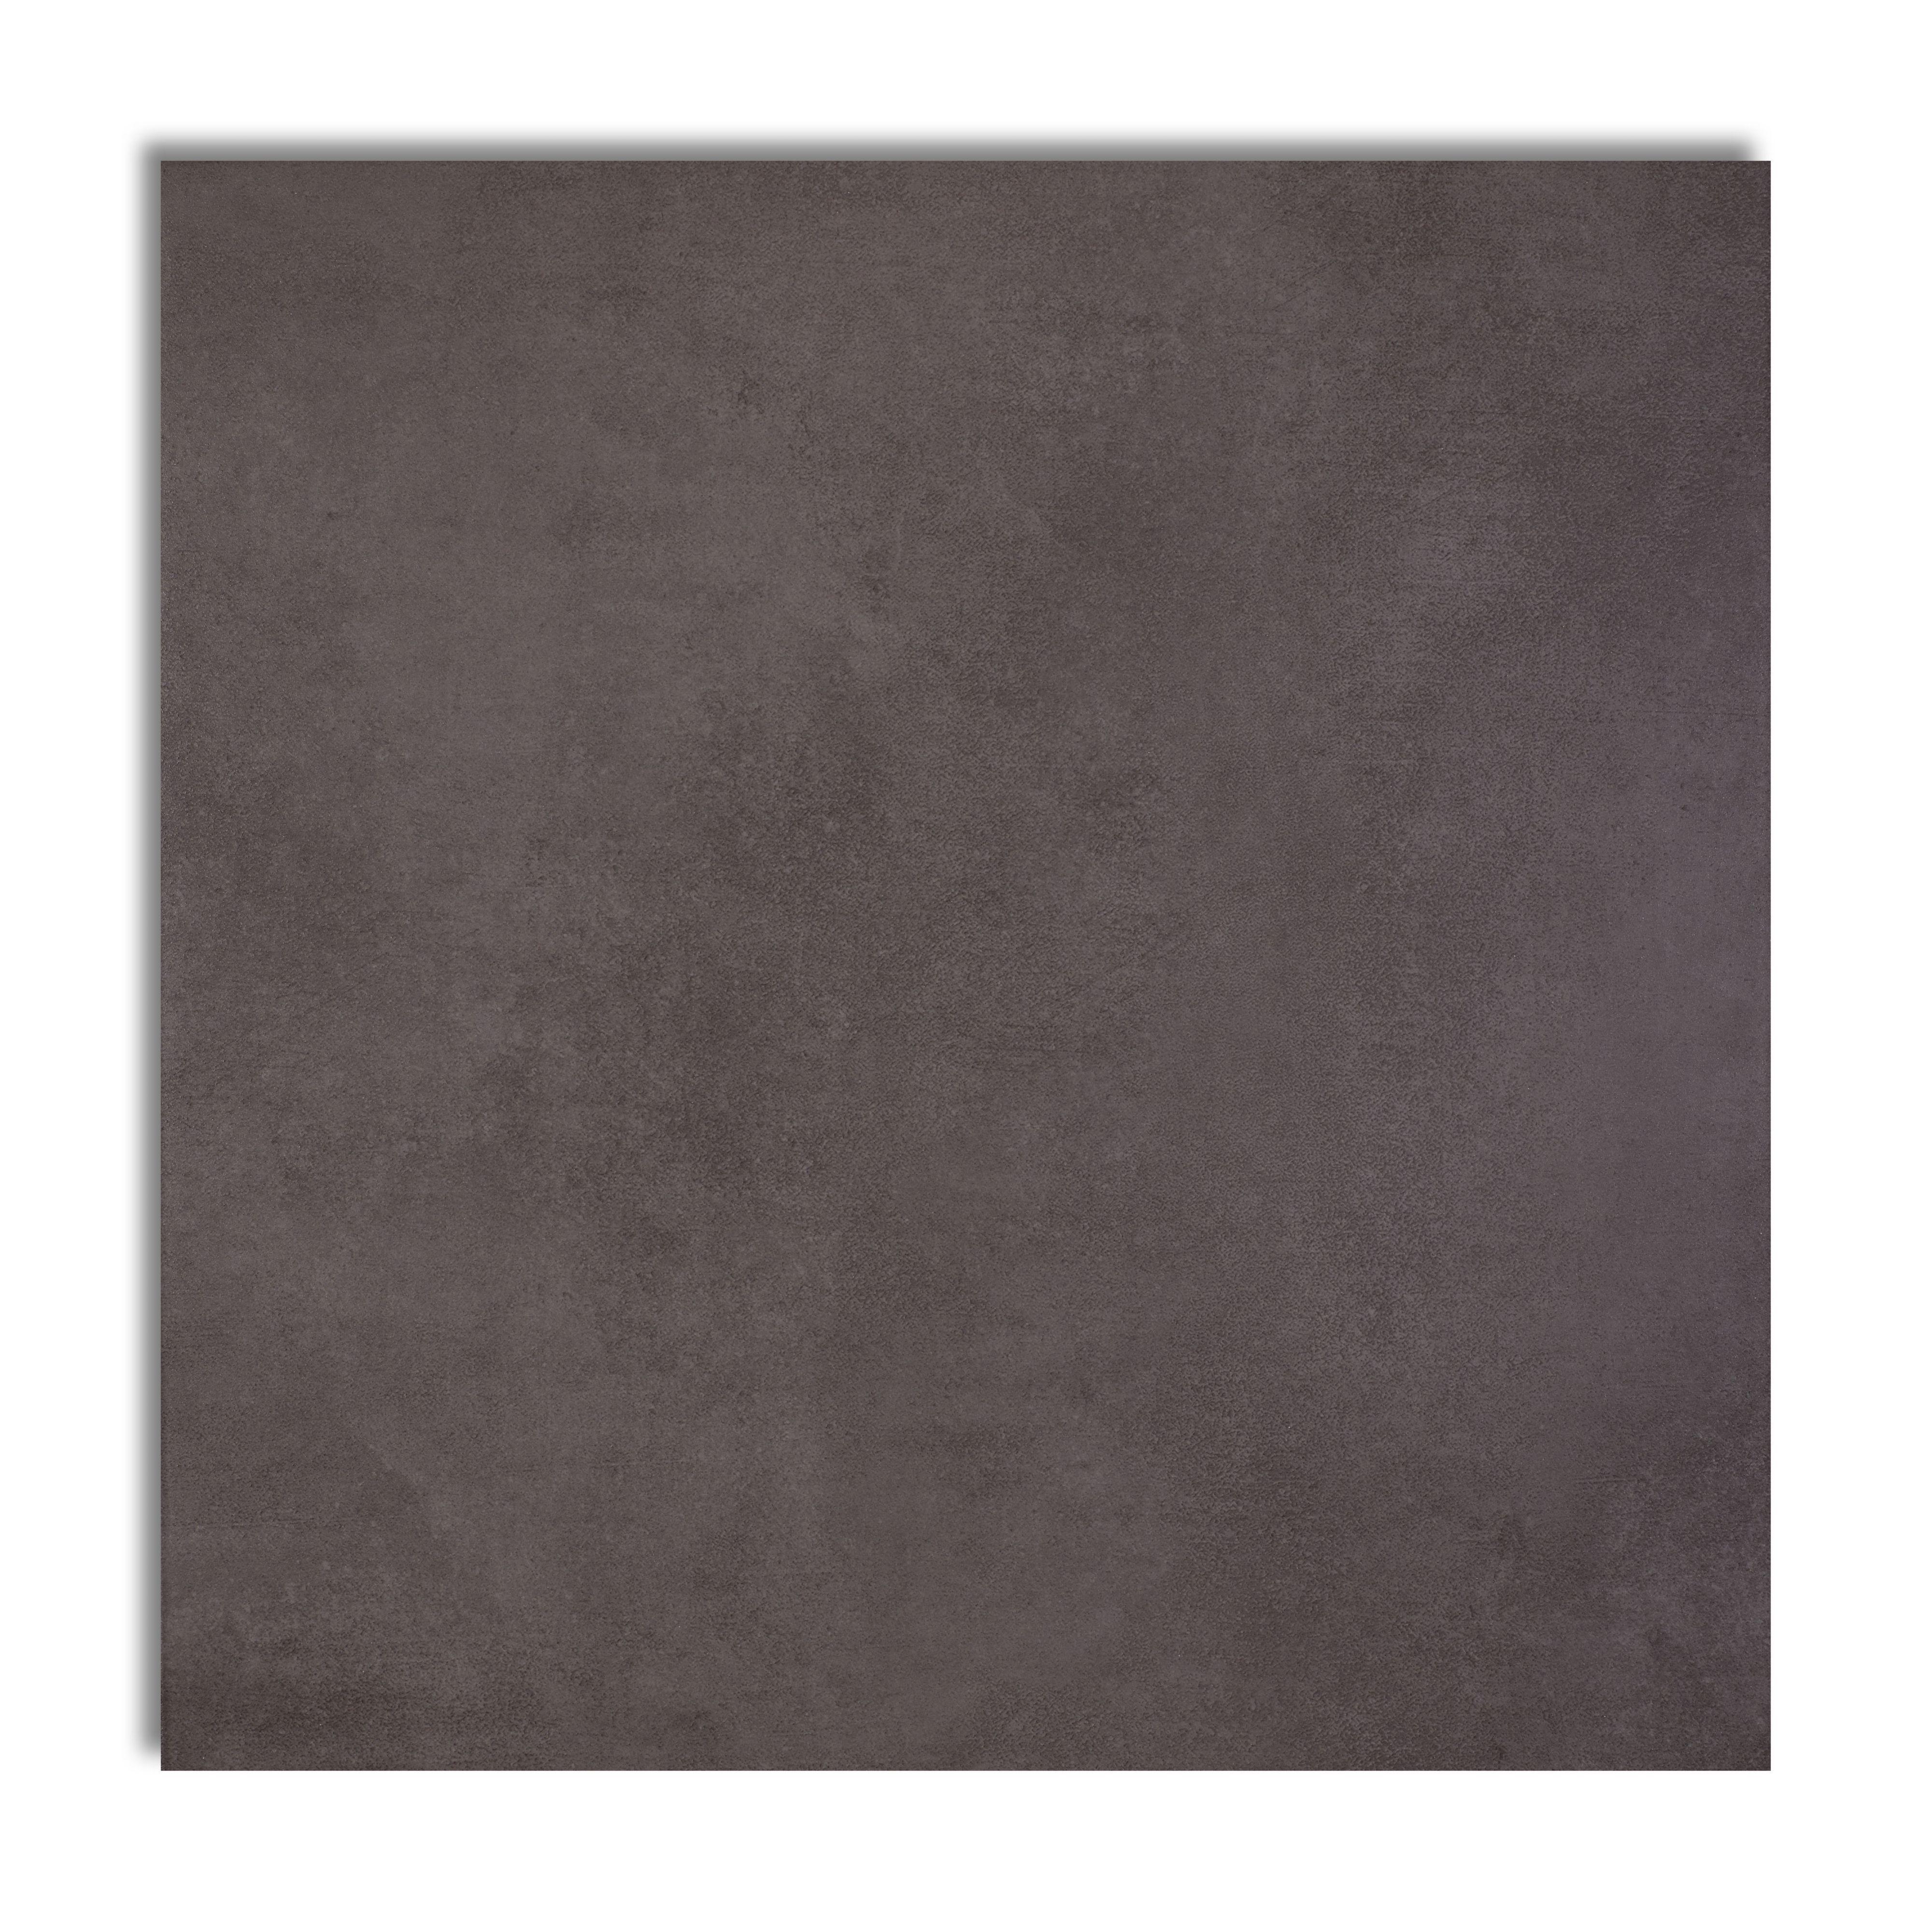 Fossilised Wood Pebble Stone Effect Ceramic Wall Floor: Oscano Pebble Stone Effect Ceramic Wall & Floor Tile, Pack